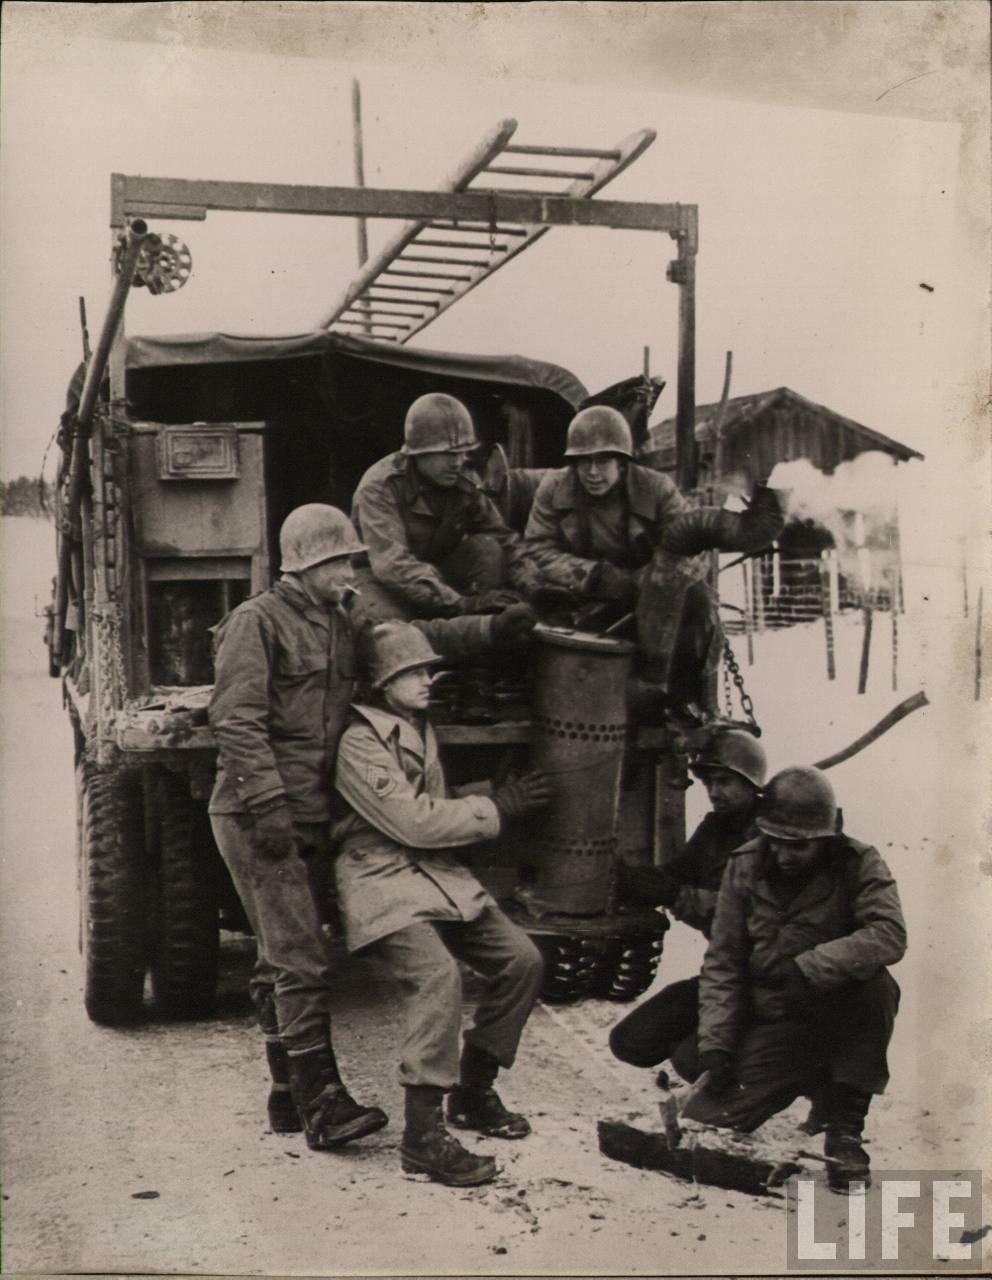 Diverses photos de la WWII - Page 5 24516